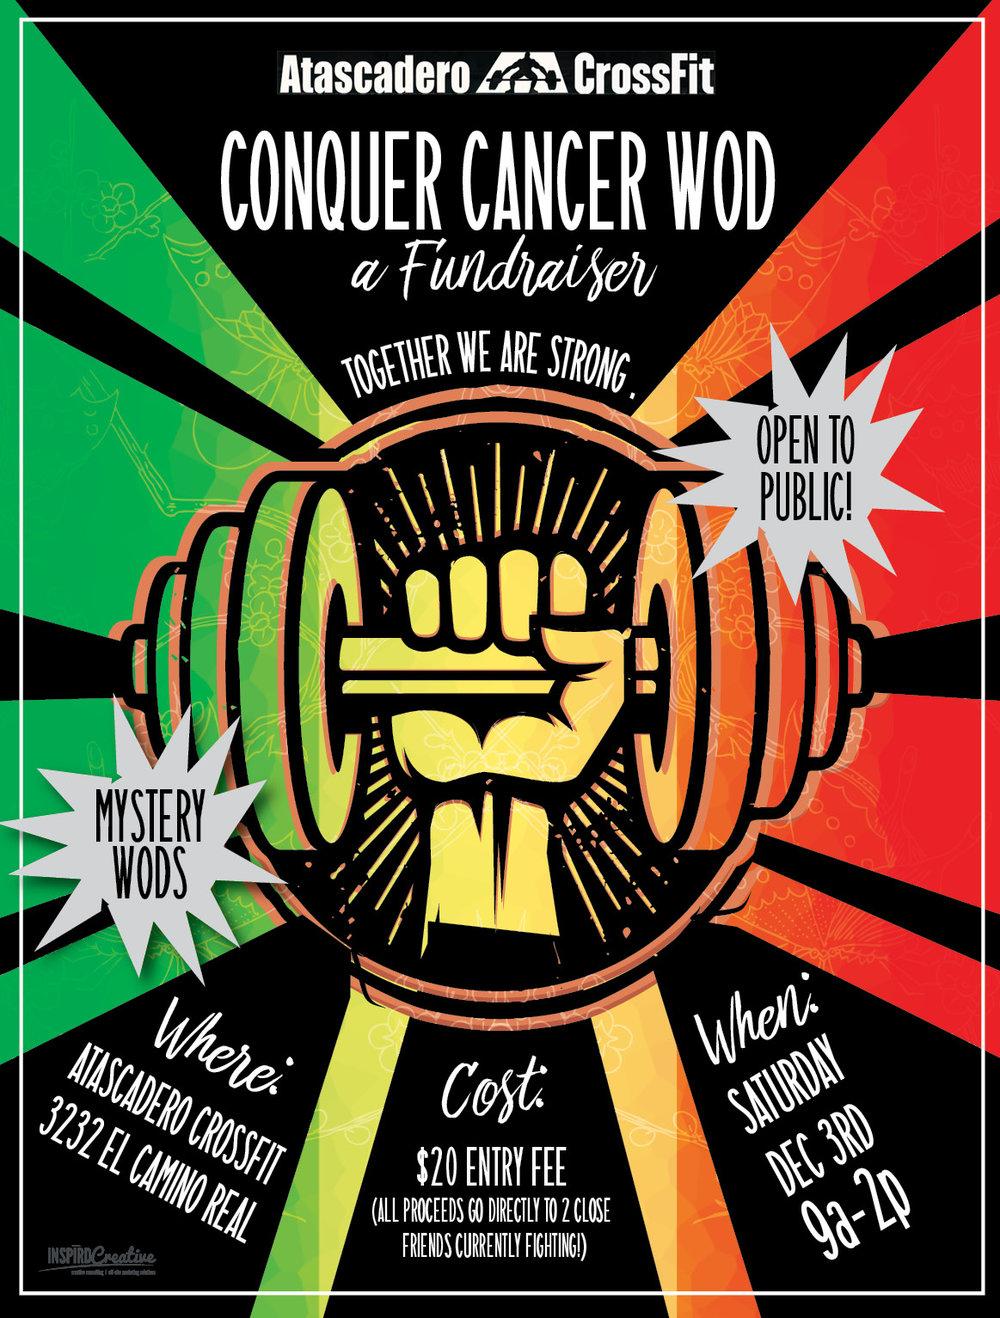 ACF Conquer Cancer Wod_flyer.jpg